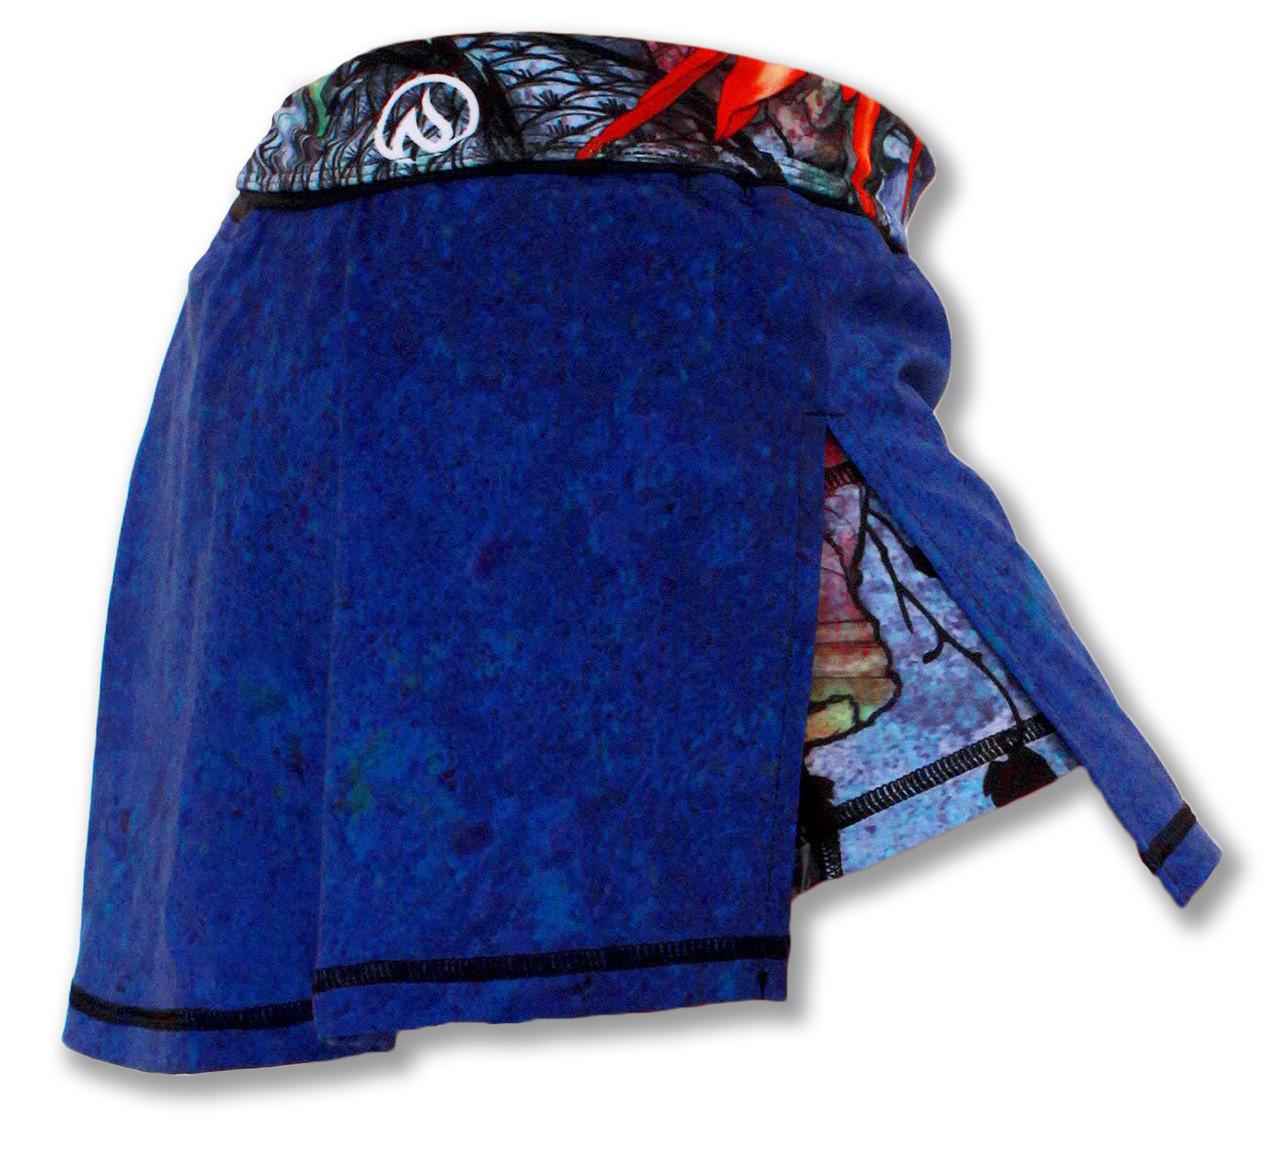 INKnBURN Women's Ryu Skirt Right Side Waistband Folded Down